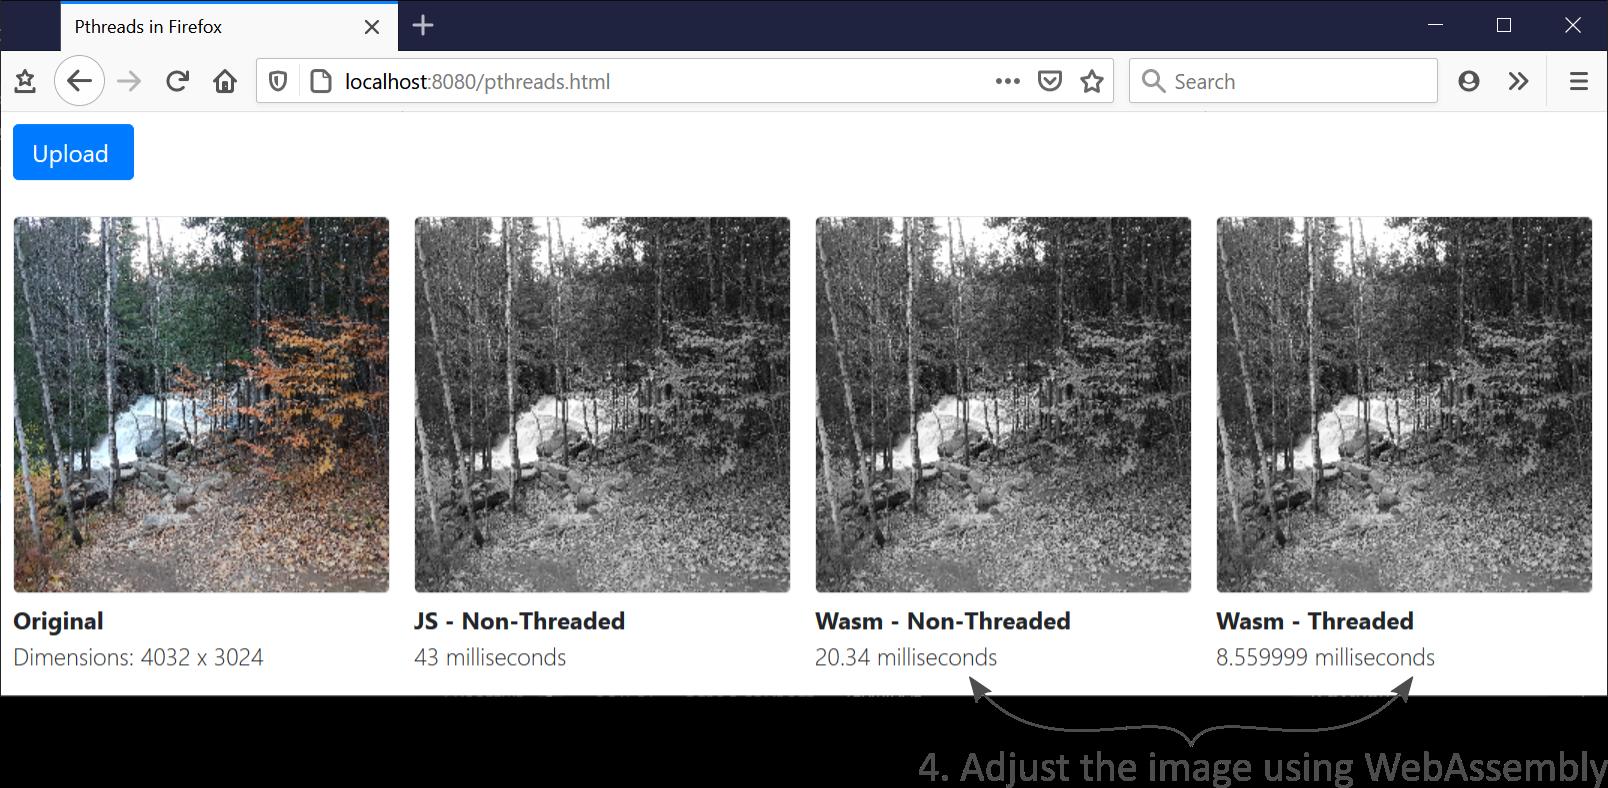 Adjusting the image using WebAssembly